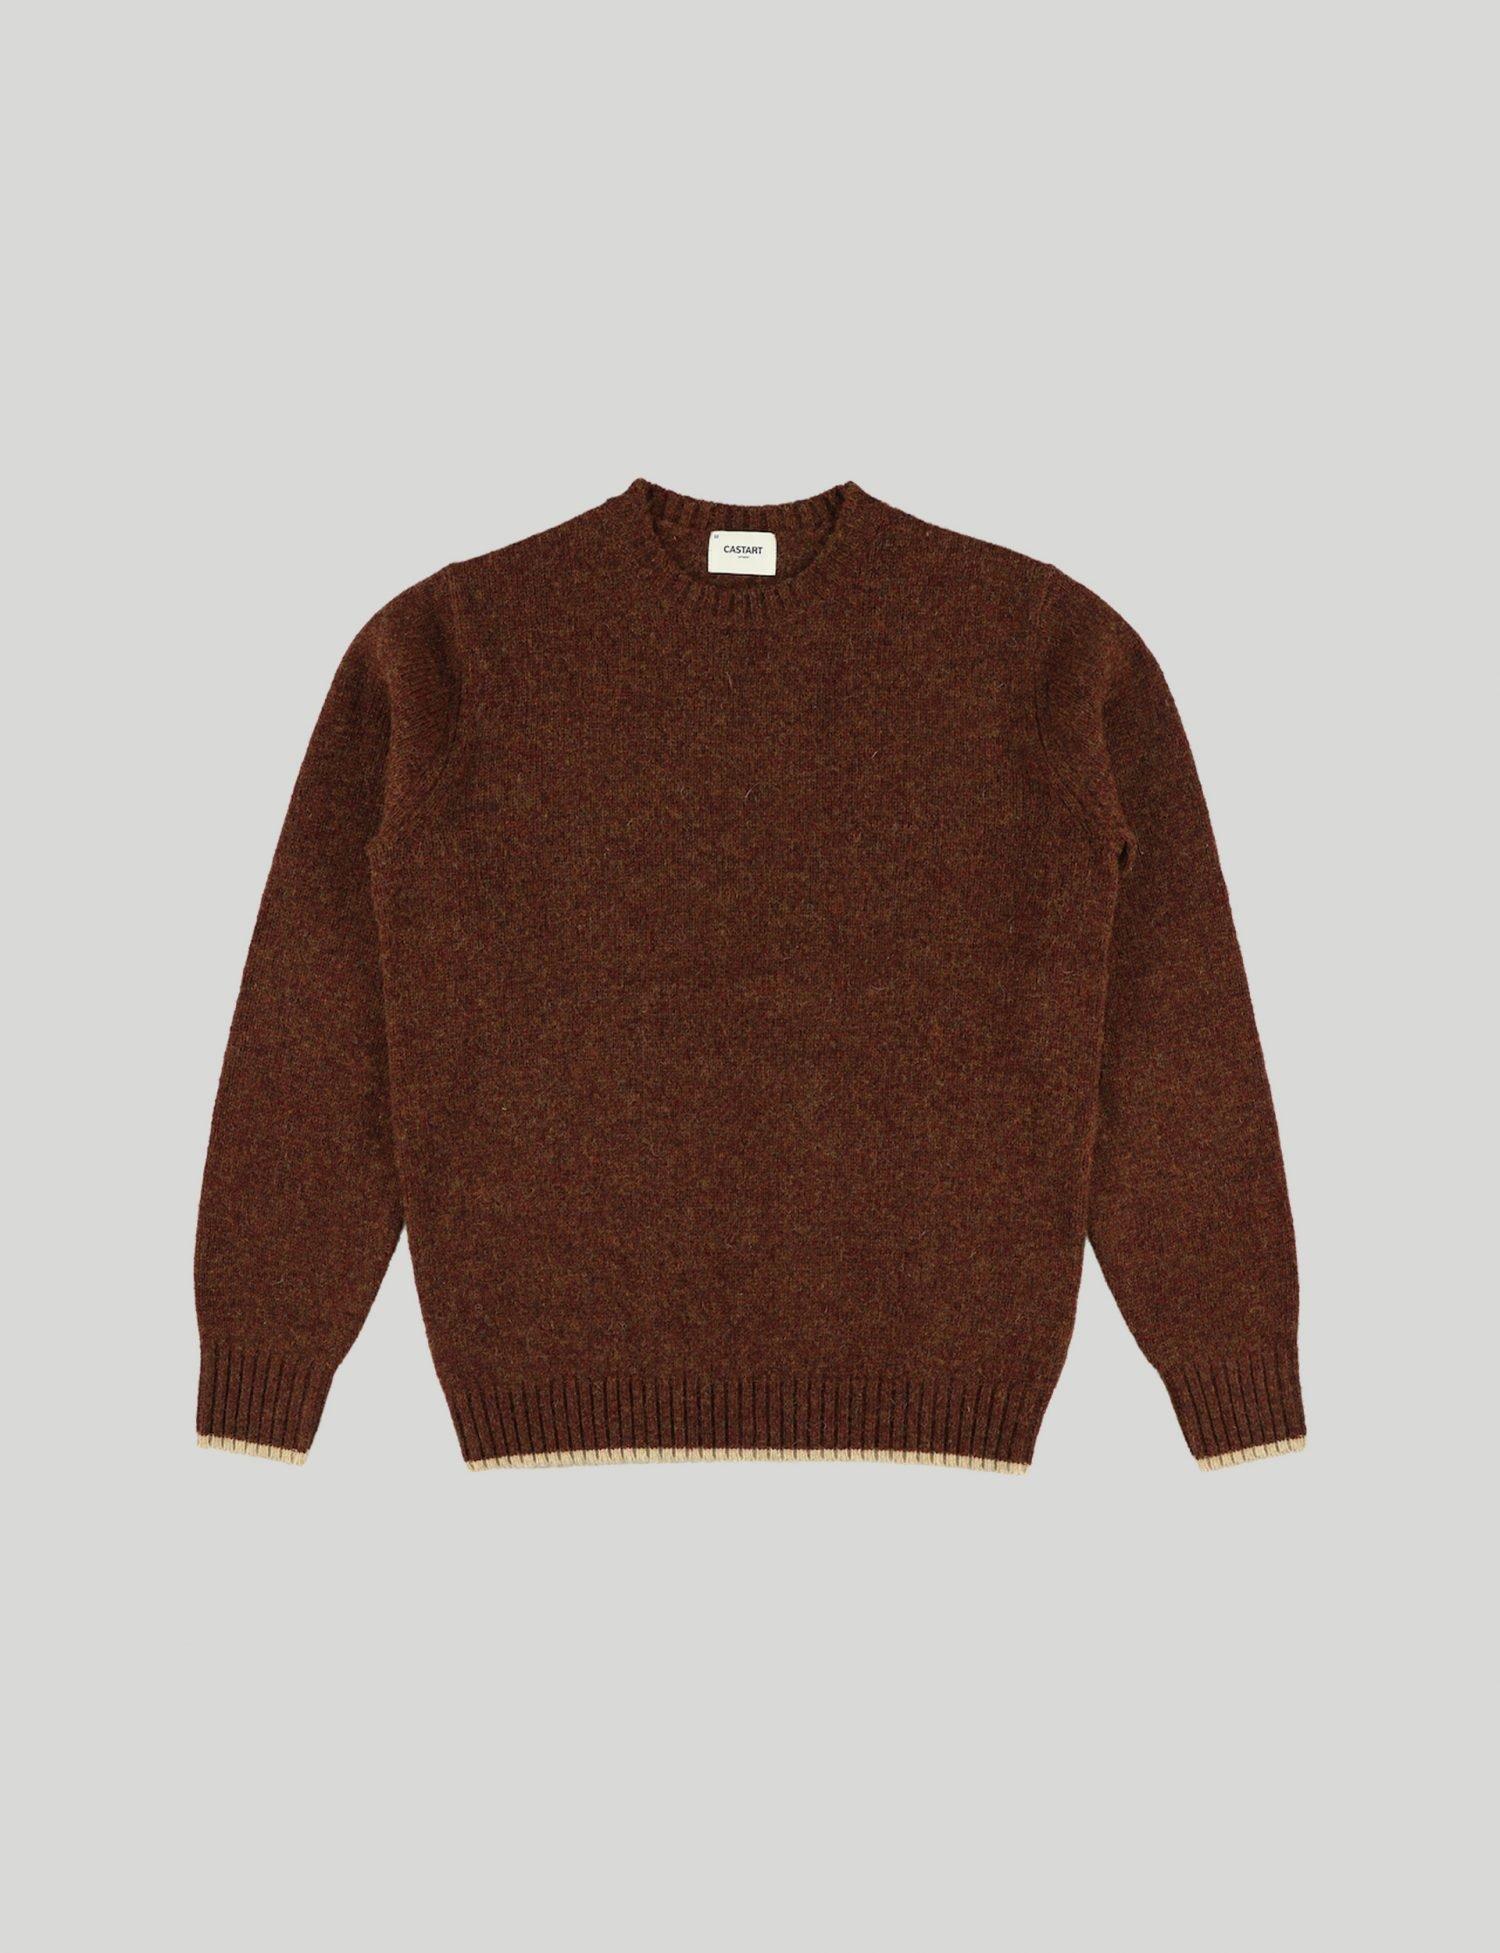 Castart - Kotin Knitwear - Brown